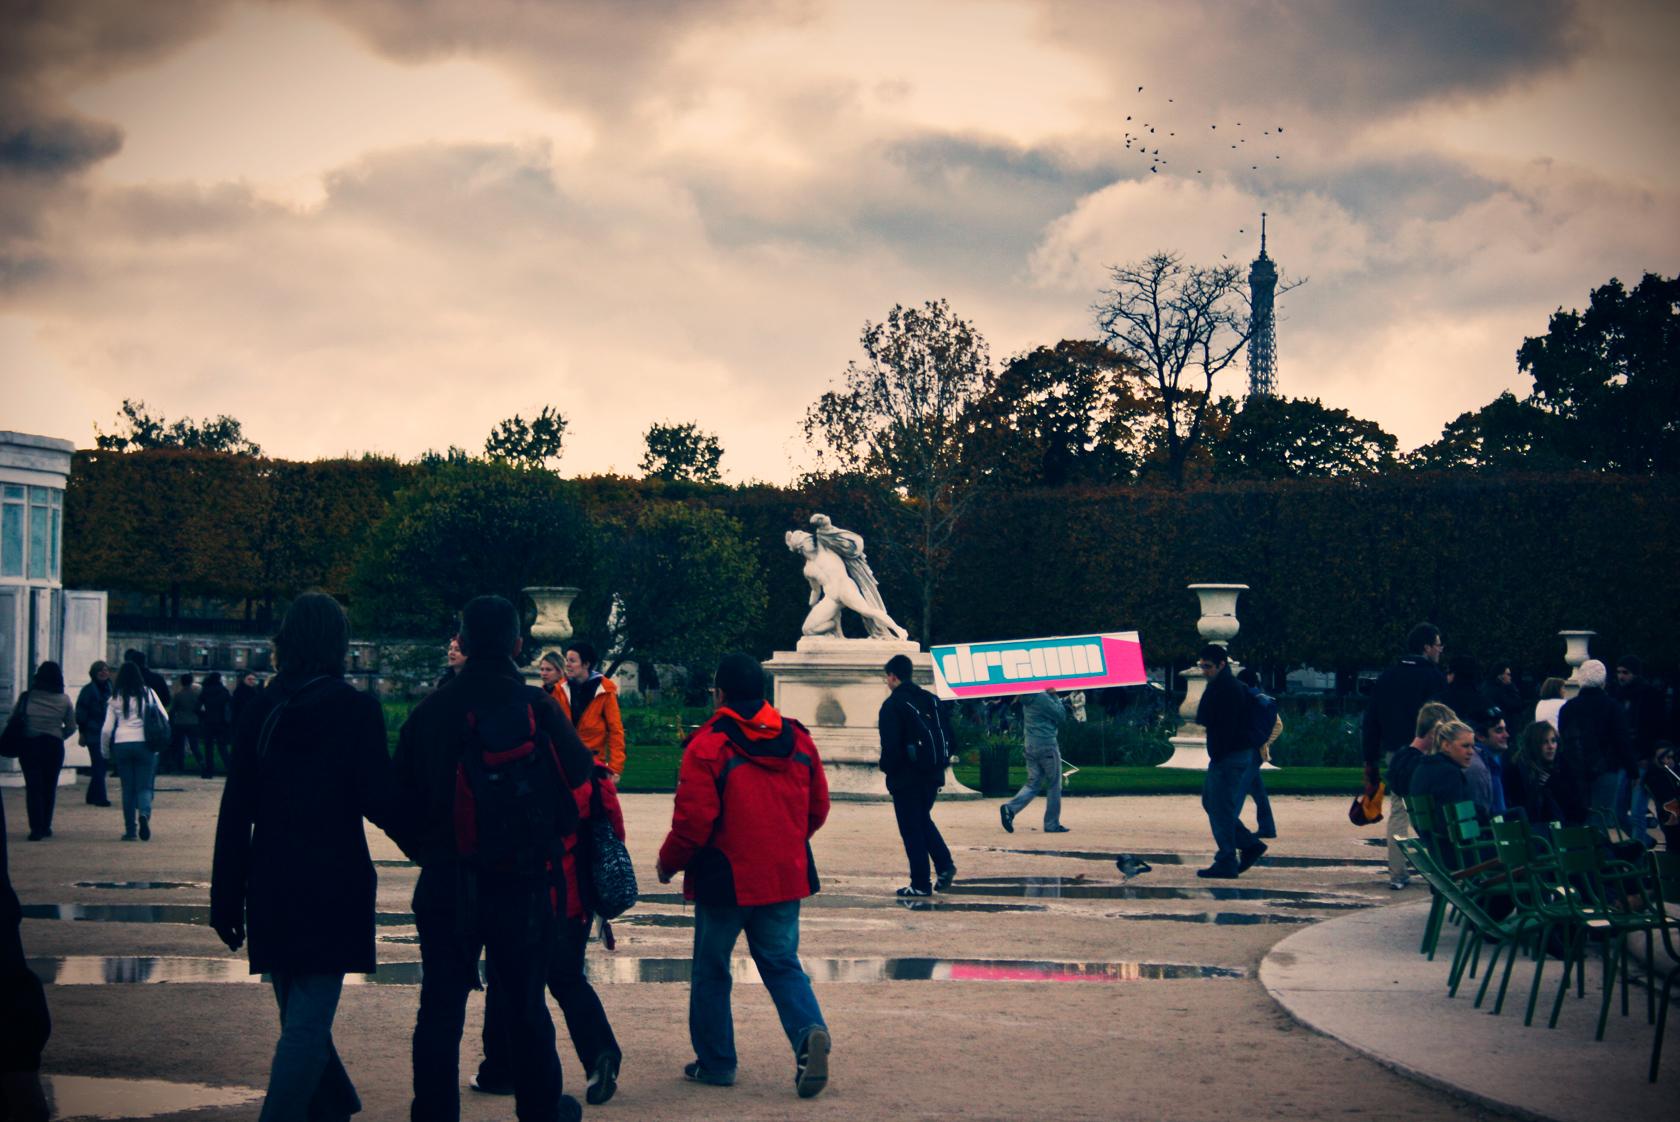 Jardin des Tuileries_dream_Paris_by_camilo_rojas_paris (4)_o.jpg